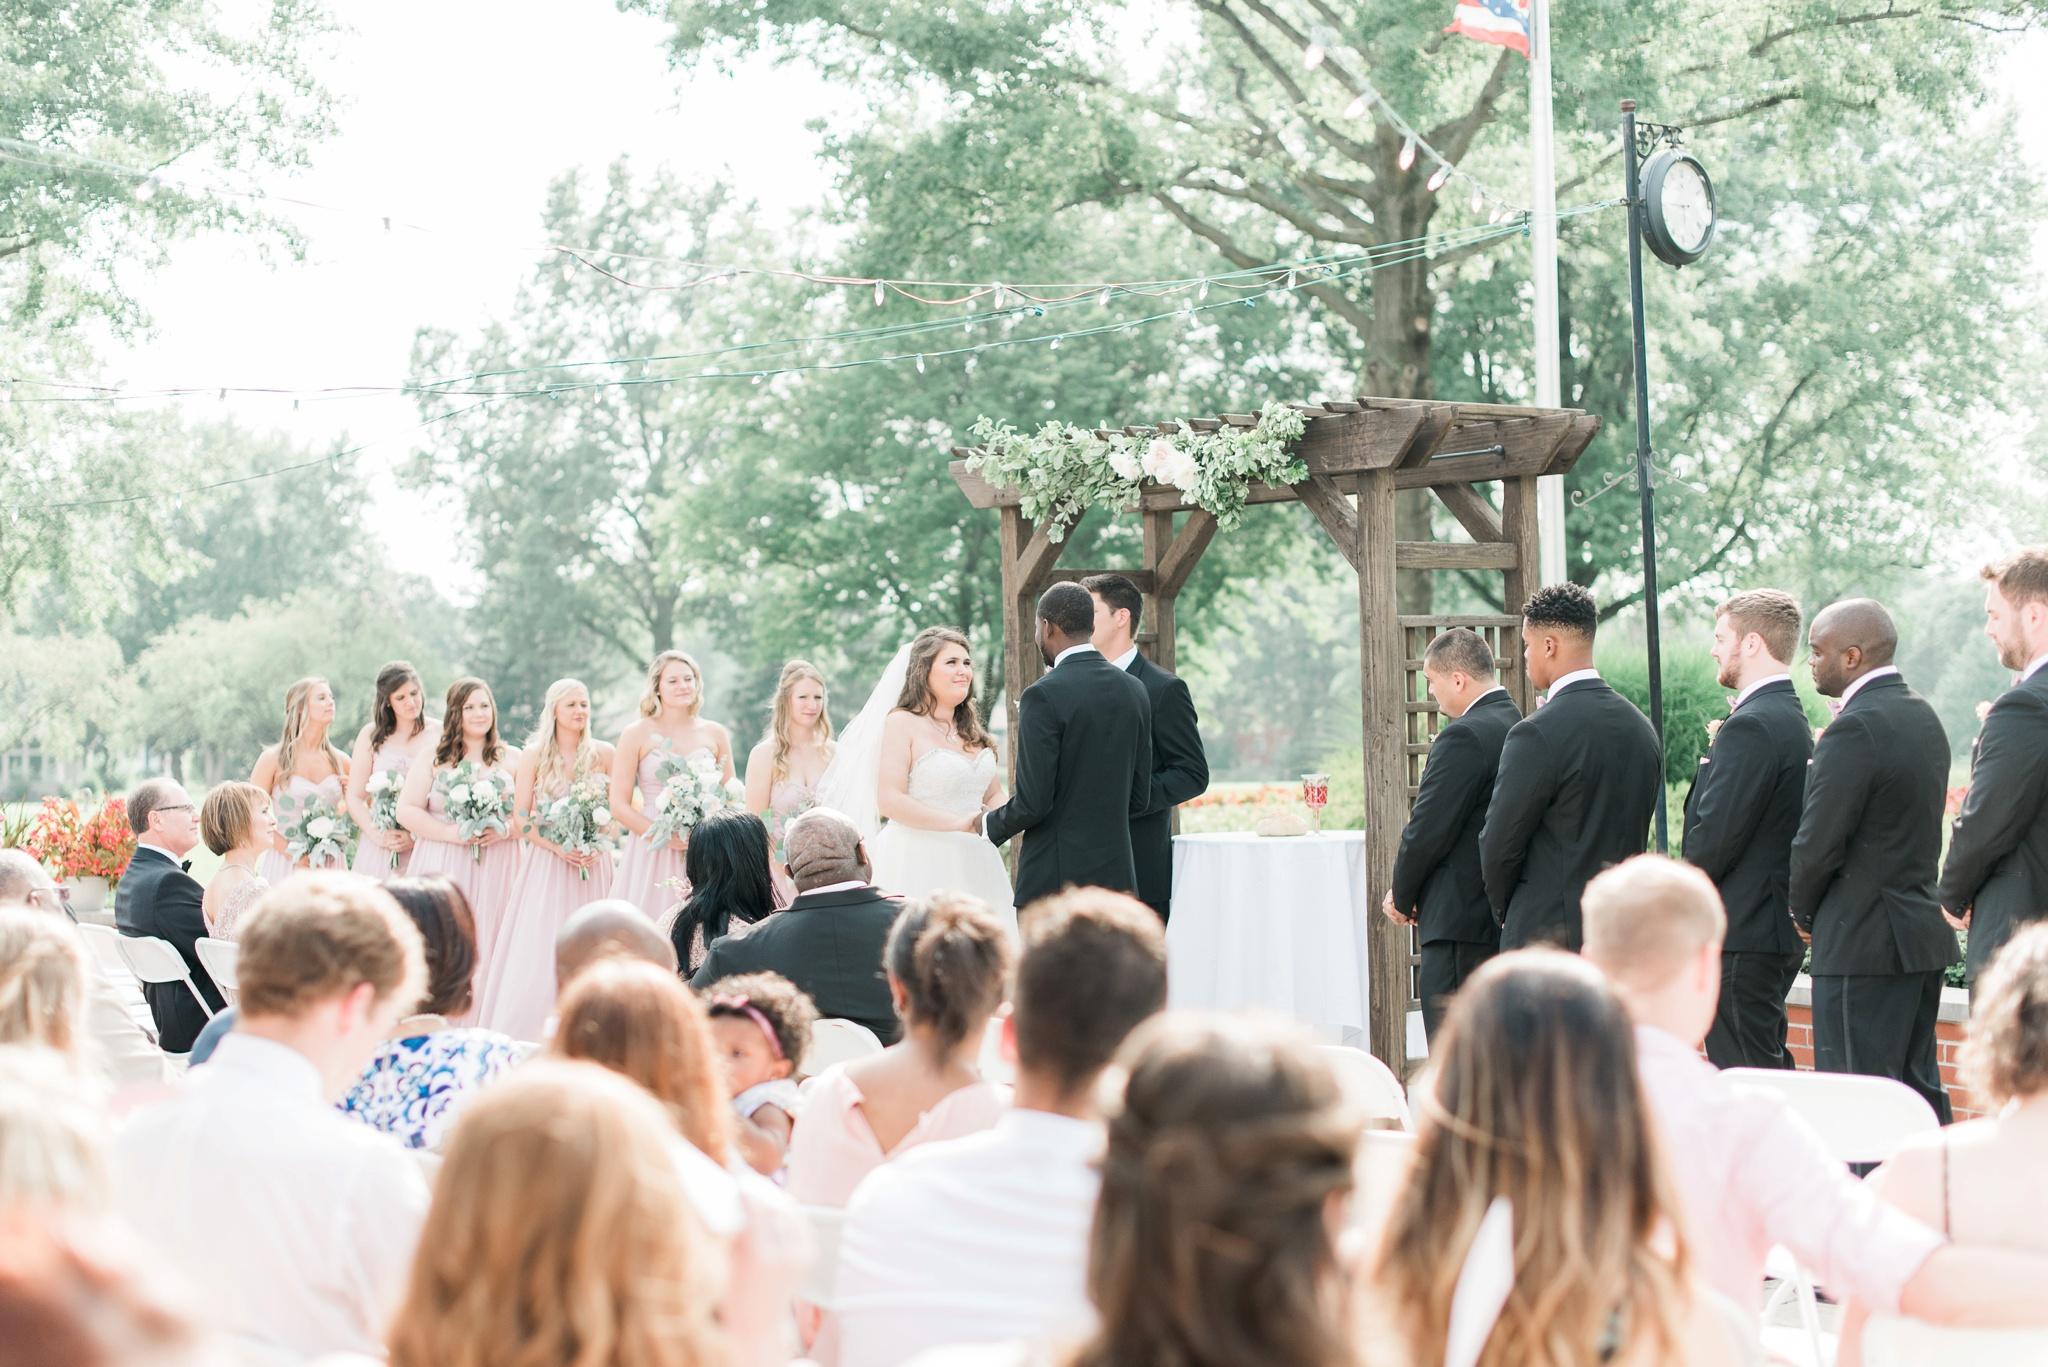 worthington-hills-country-club-wedding-columbus-ohio-meg-evan_0053.jpg